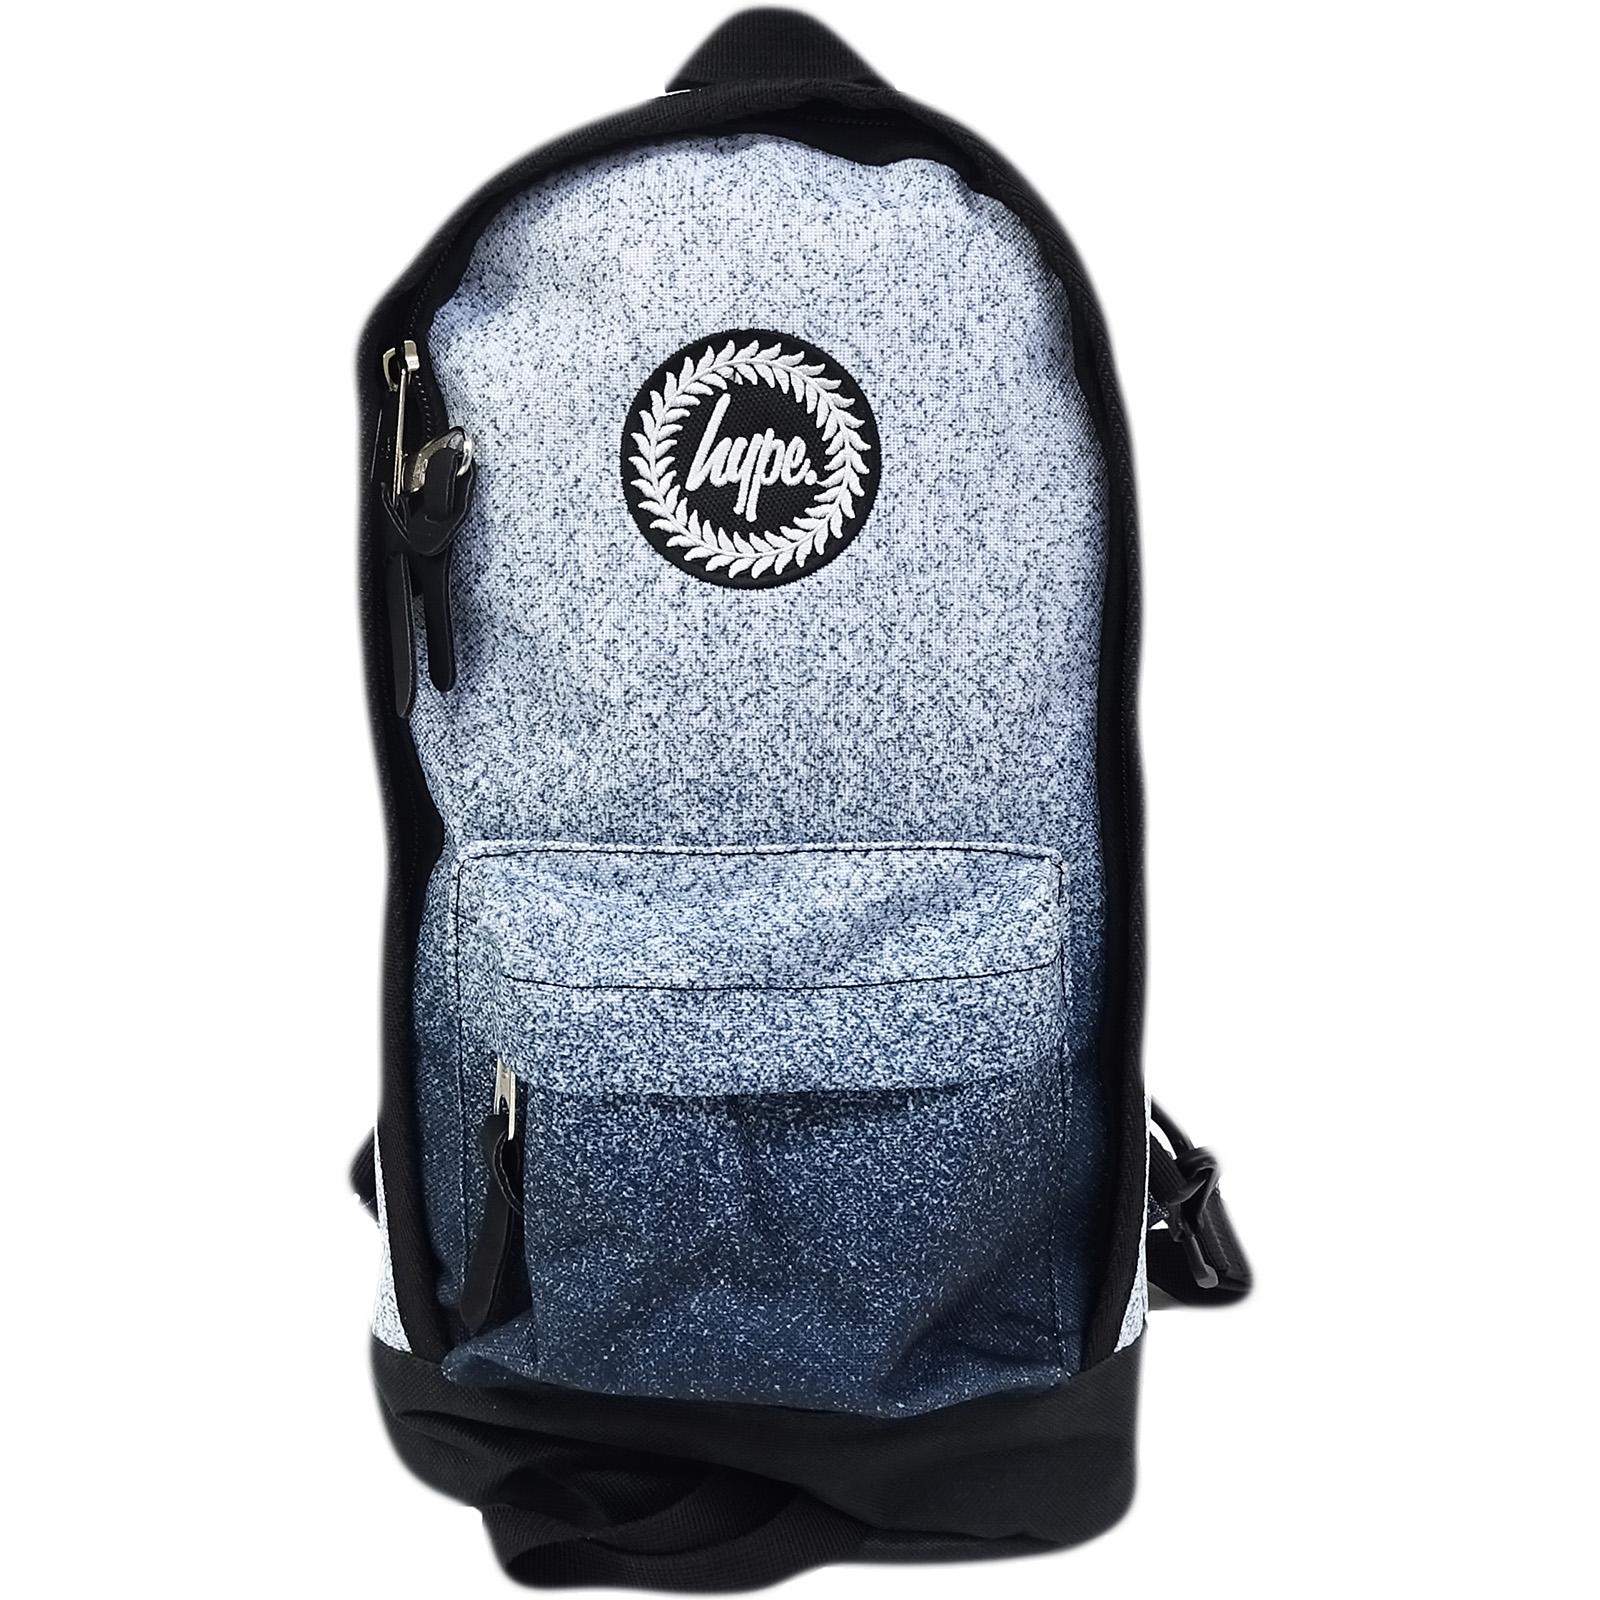 Hype Small Over Shoulder Side Bag Speckle Fade